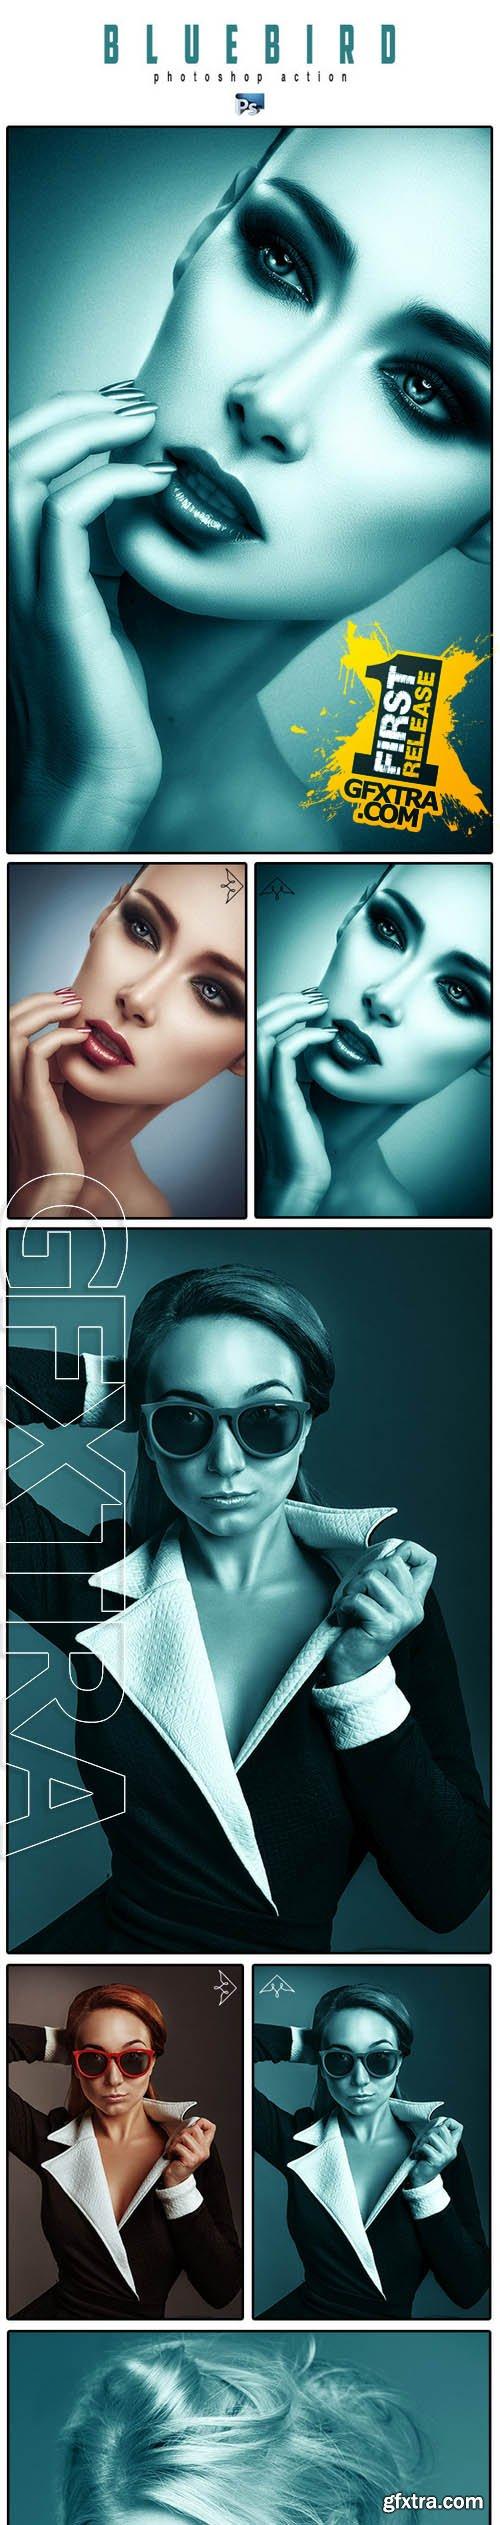 Bluebird Photoshop Action - GraphicRiver 11322100